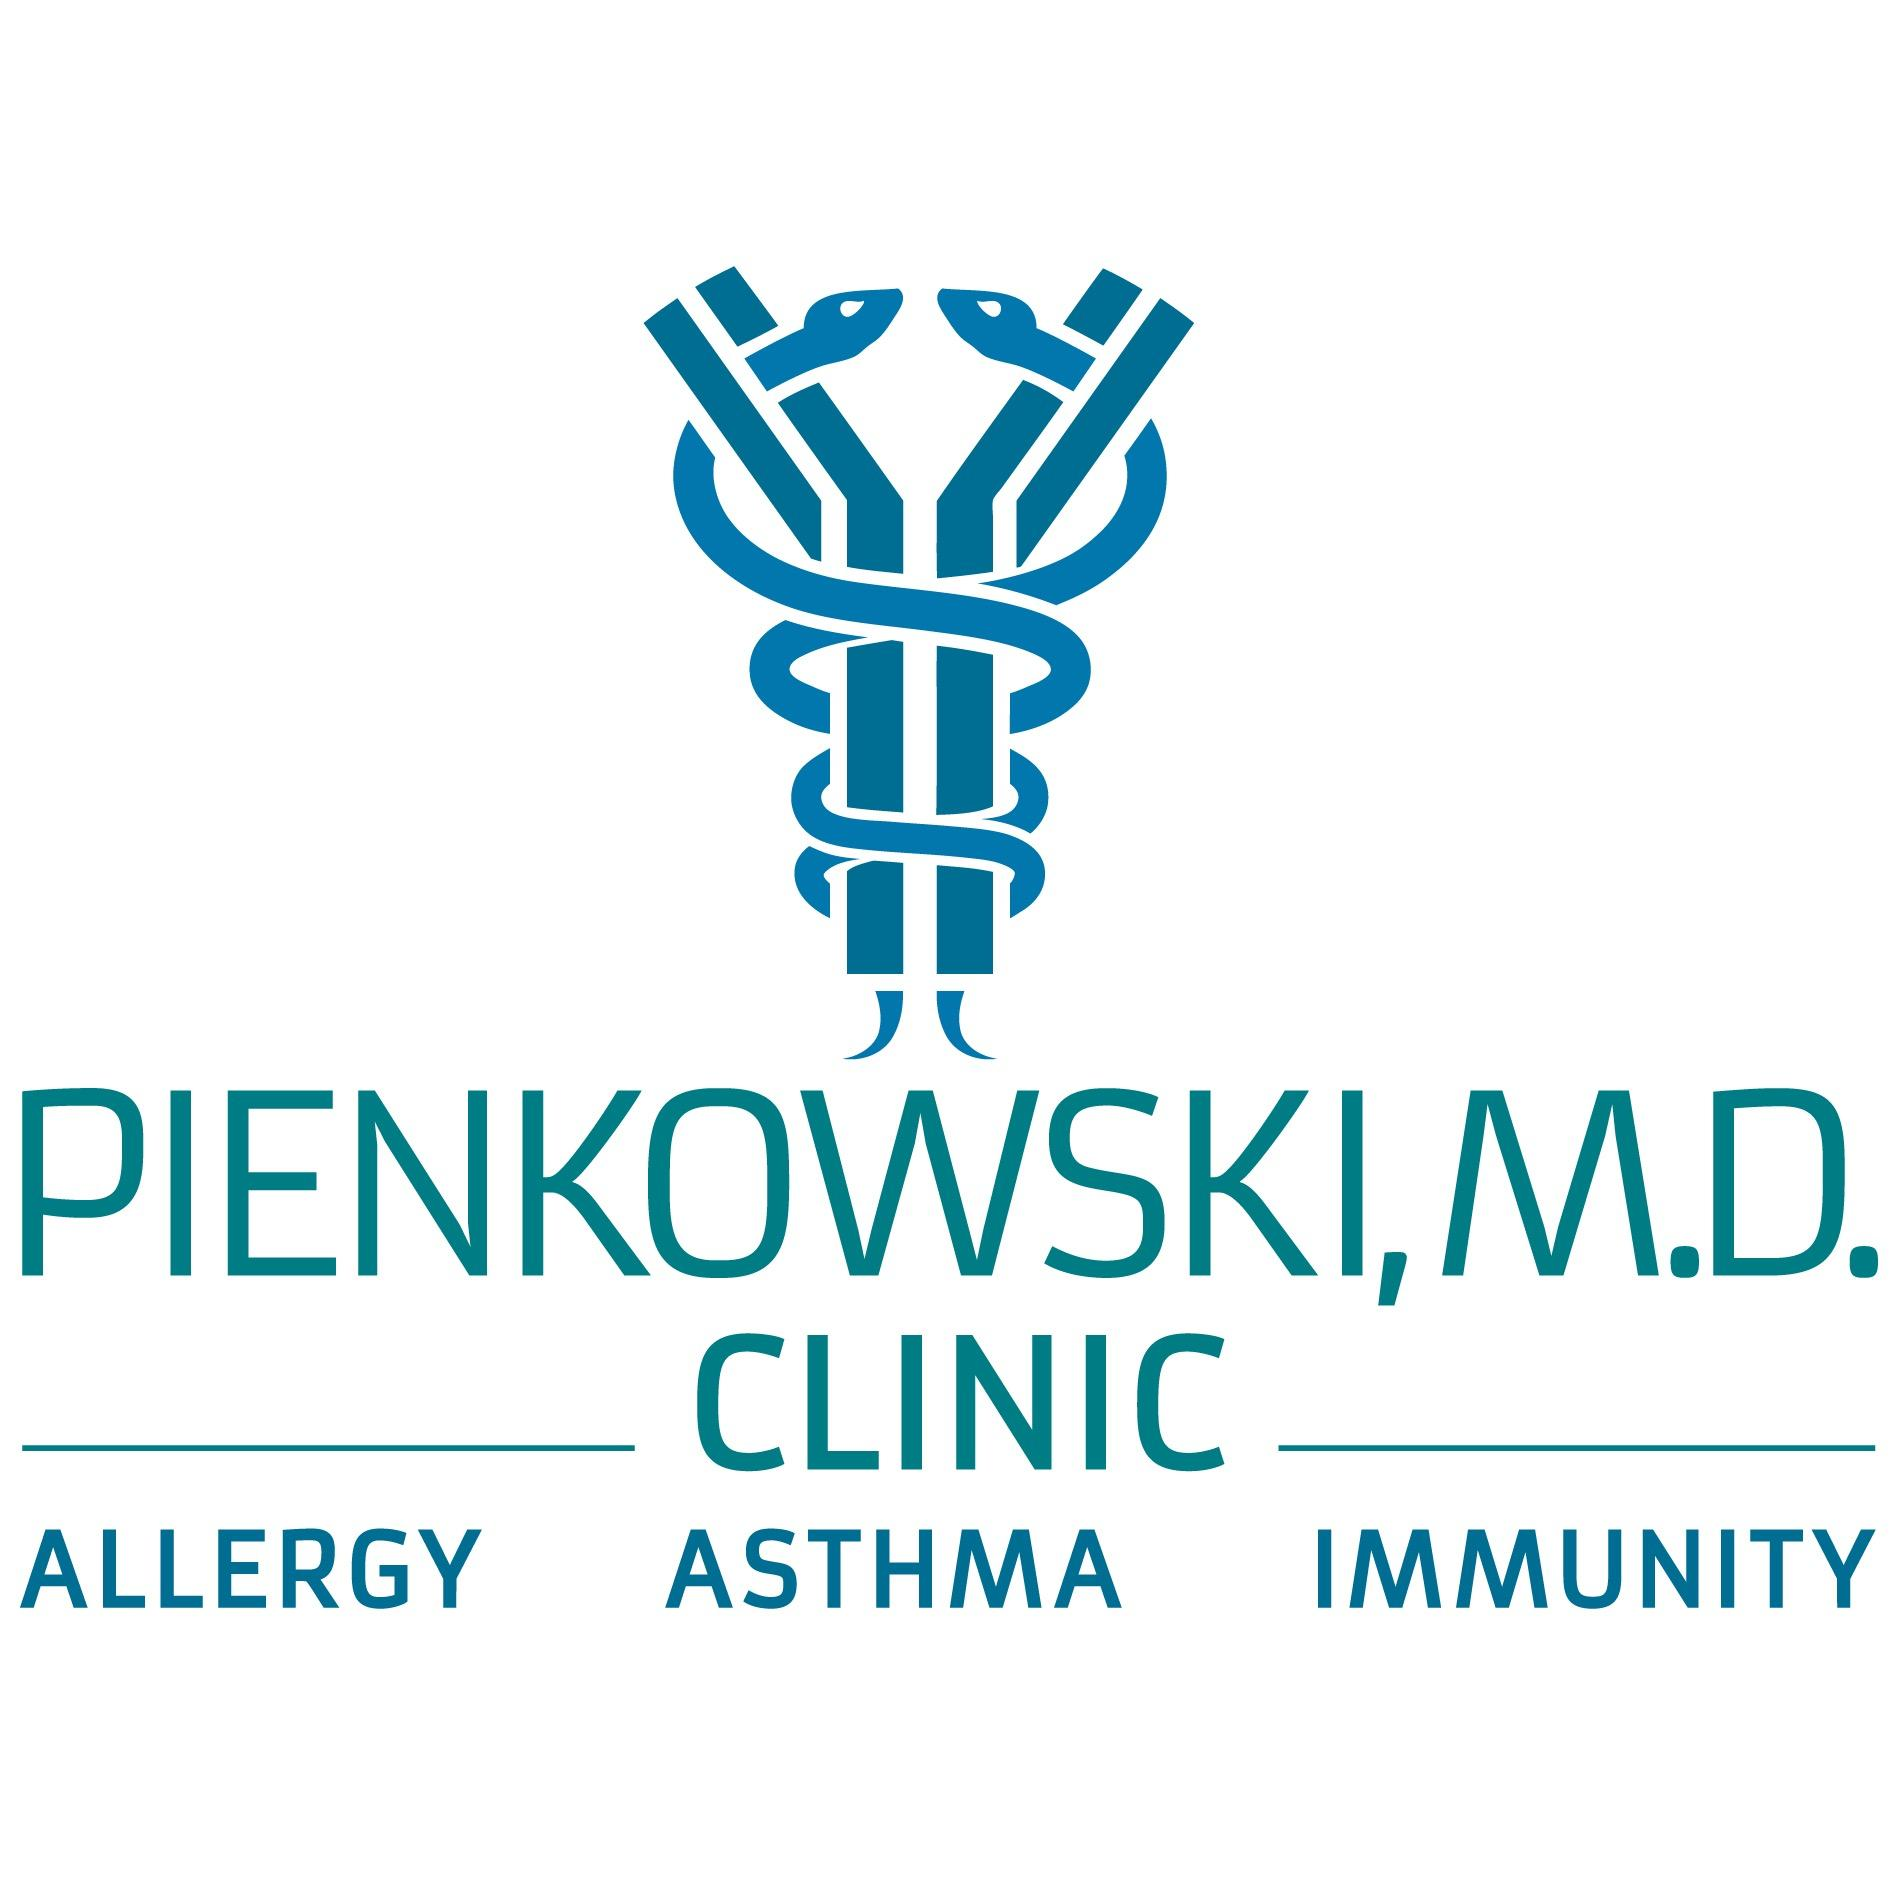 Pienkowski, M.D. Clinic - Allergy Asthma Immunity image 3